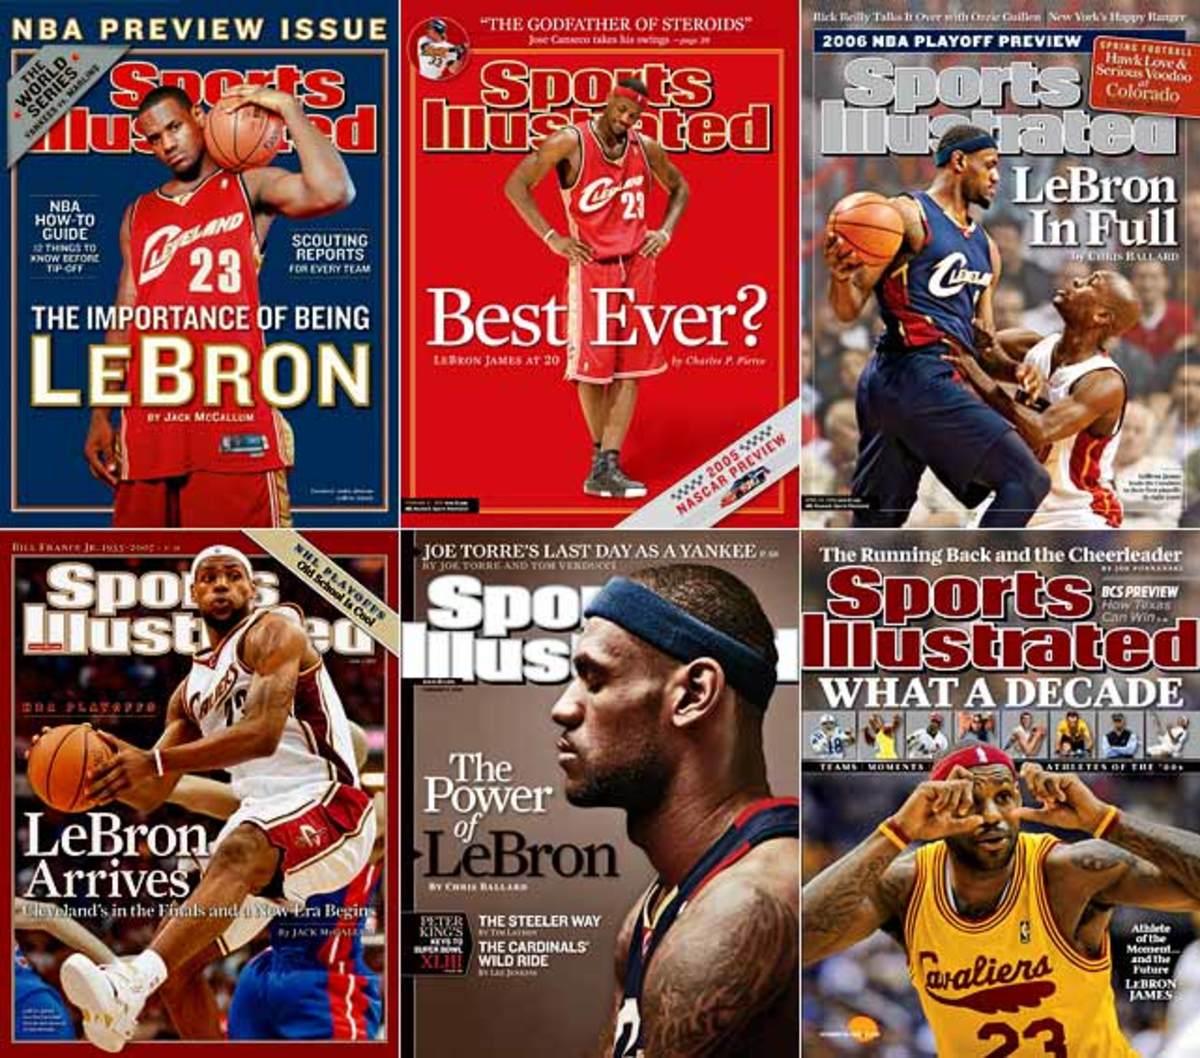 2003: LeBron James